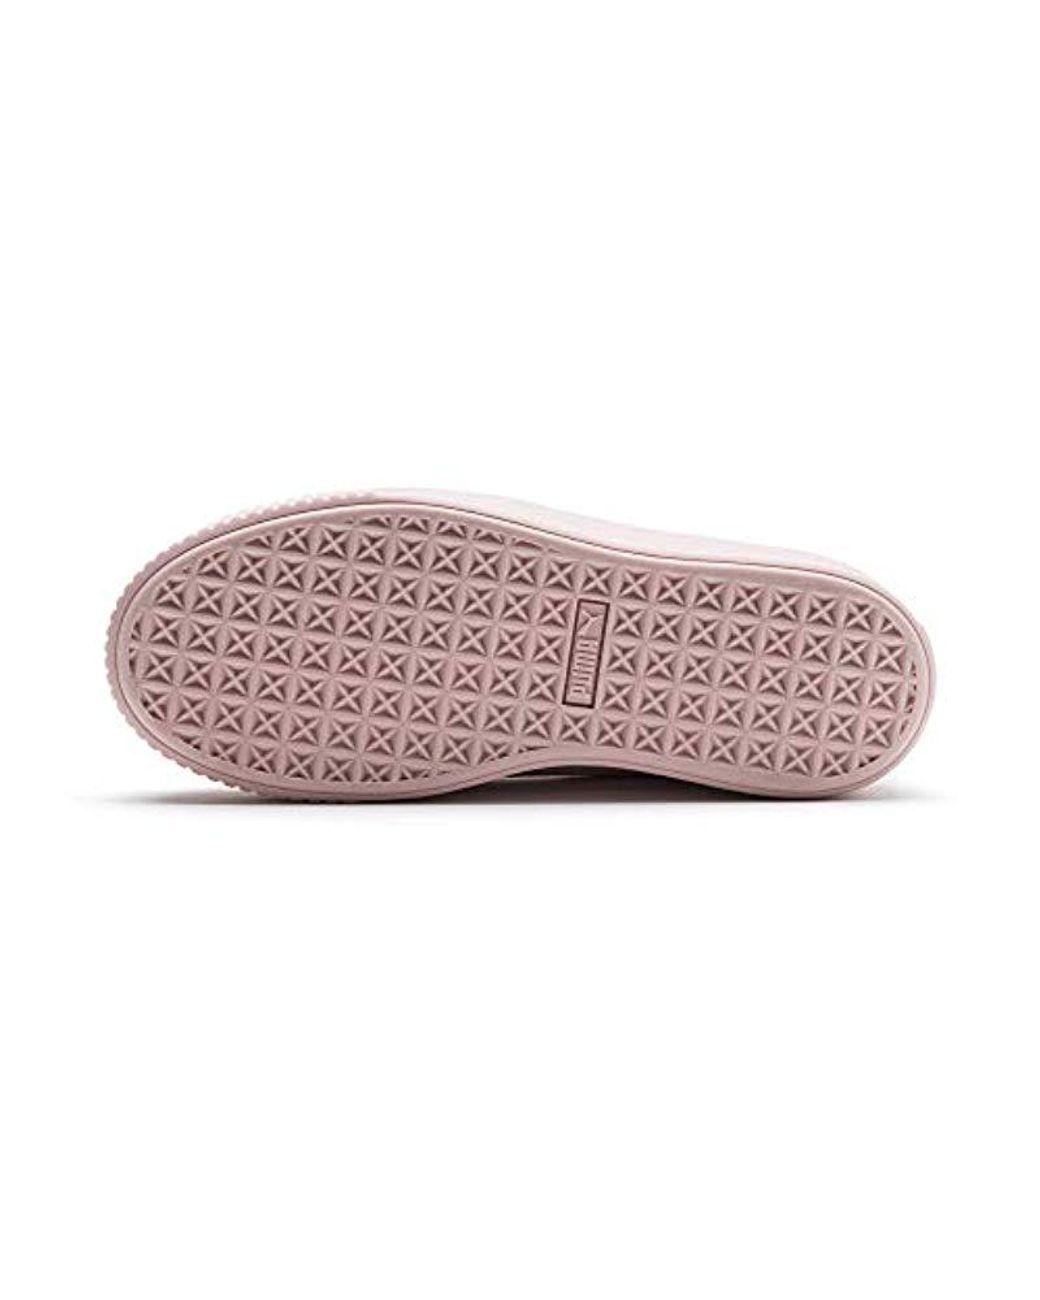 PUMA Platform Kiss Velvet Damen Sneaker in Silver Pink Gold